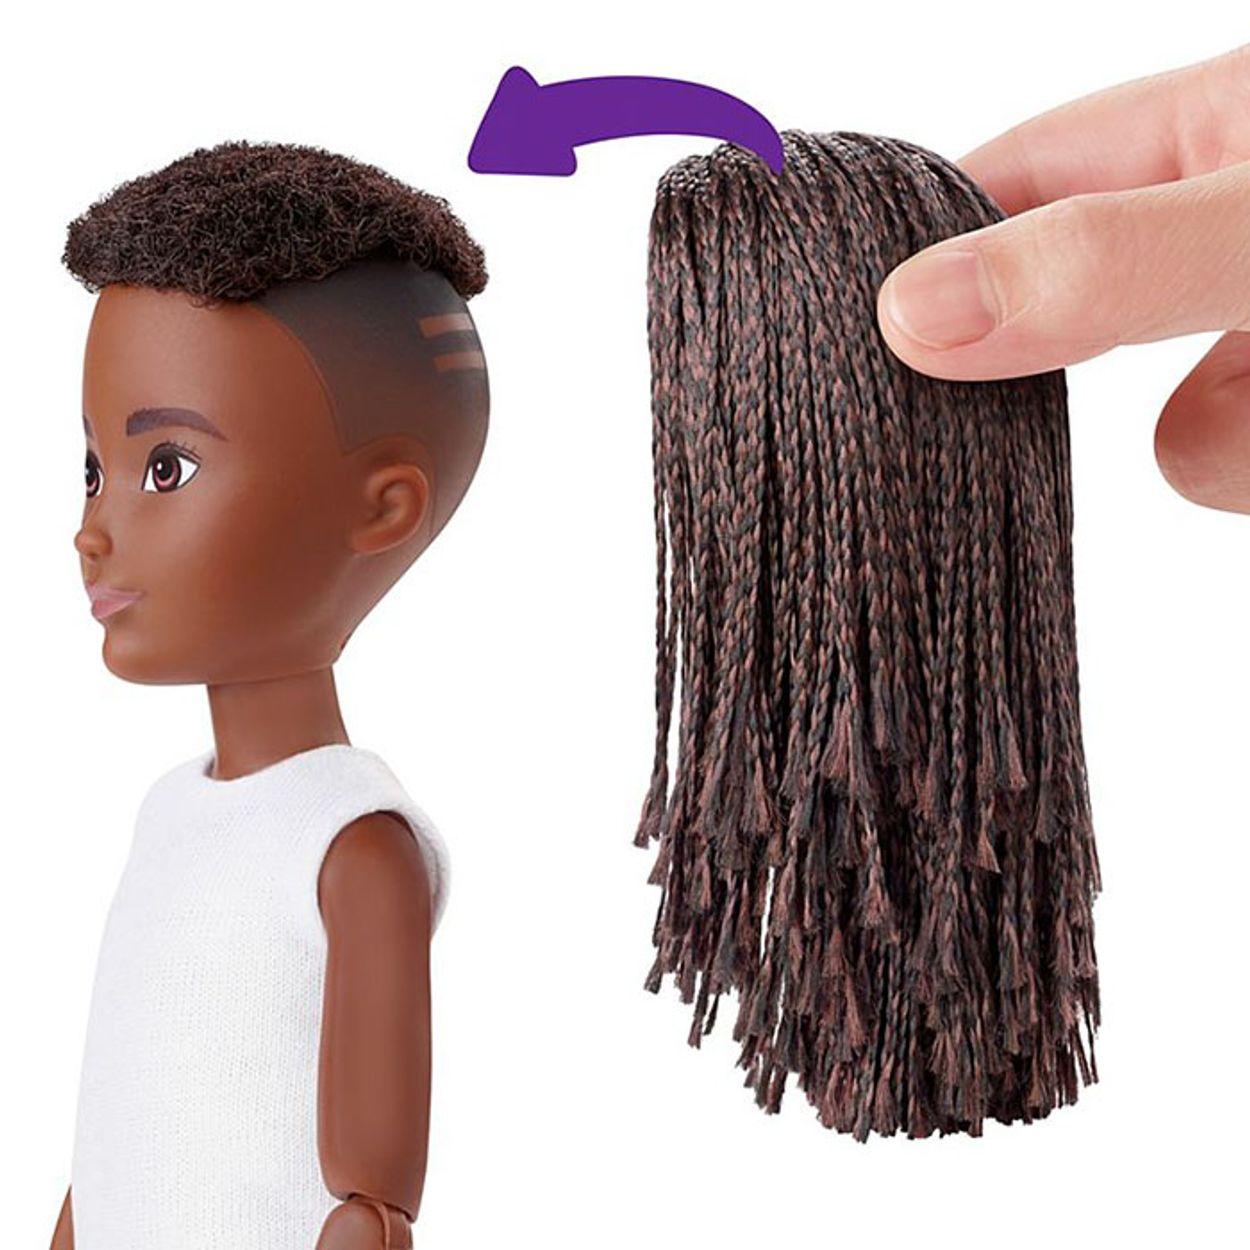 2A2 5d8c69be0985b-gender-neutral-dolls-toy-company-mattel-100